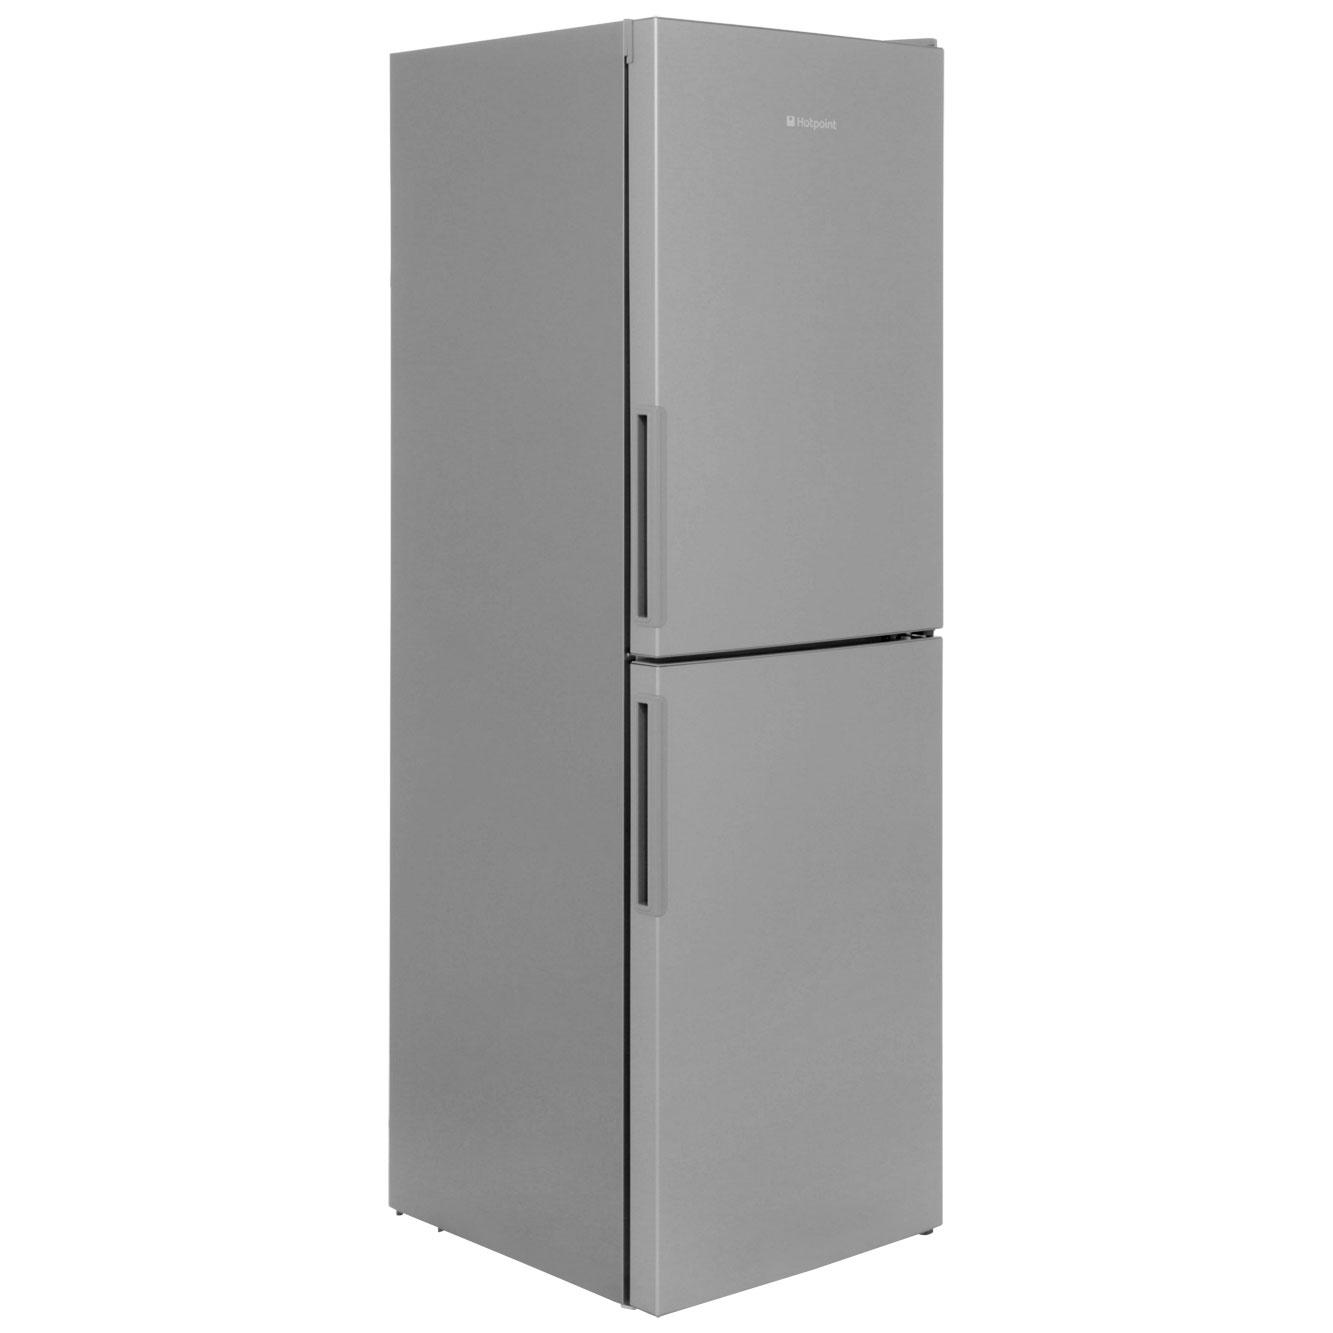 Hotpoint XAO85TIG Free Standing Fridge Freezer Frost Free in Graphite